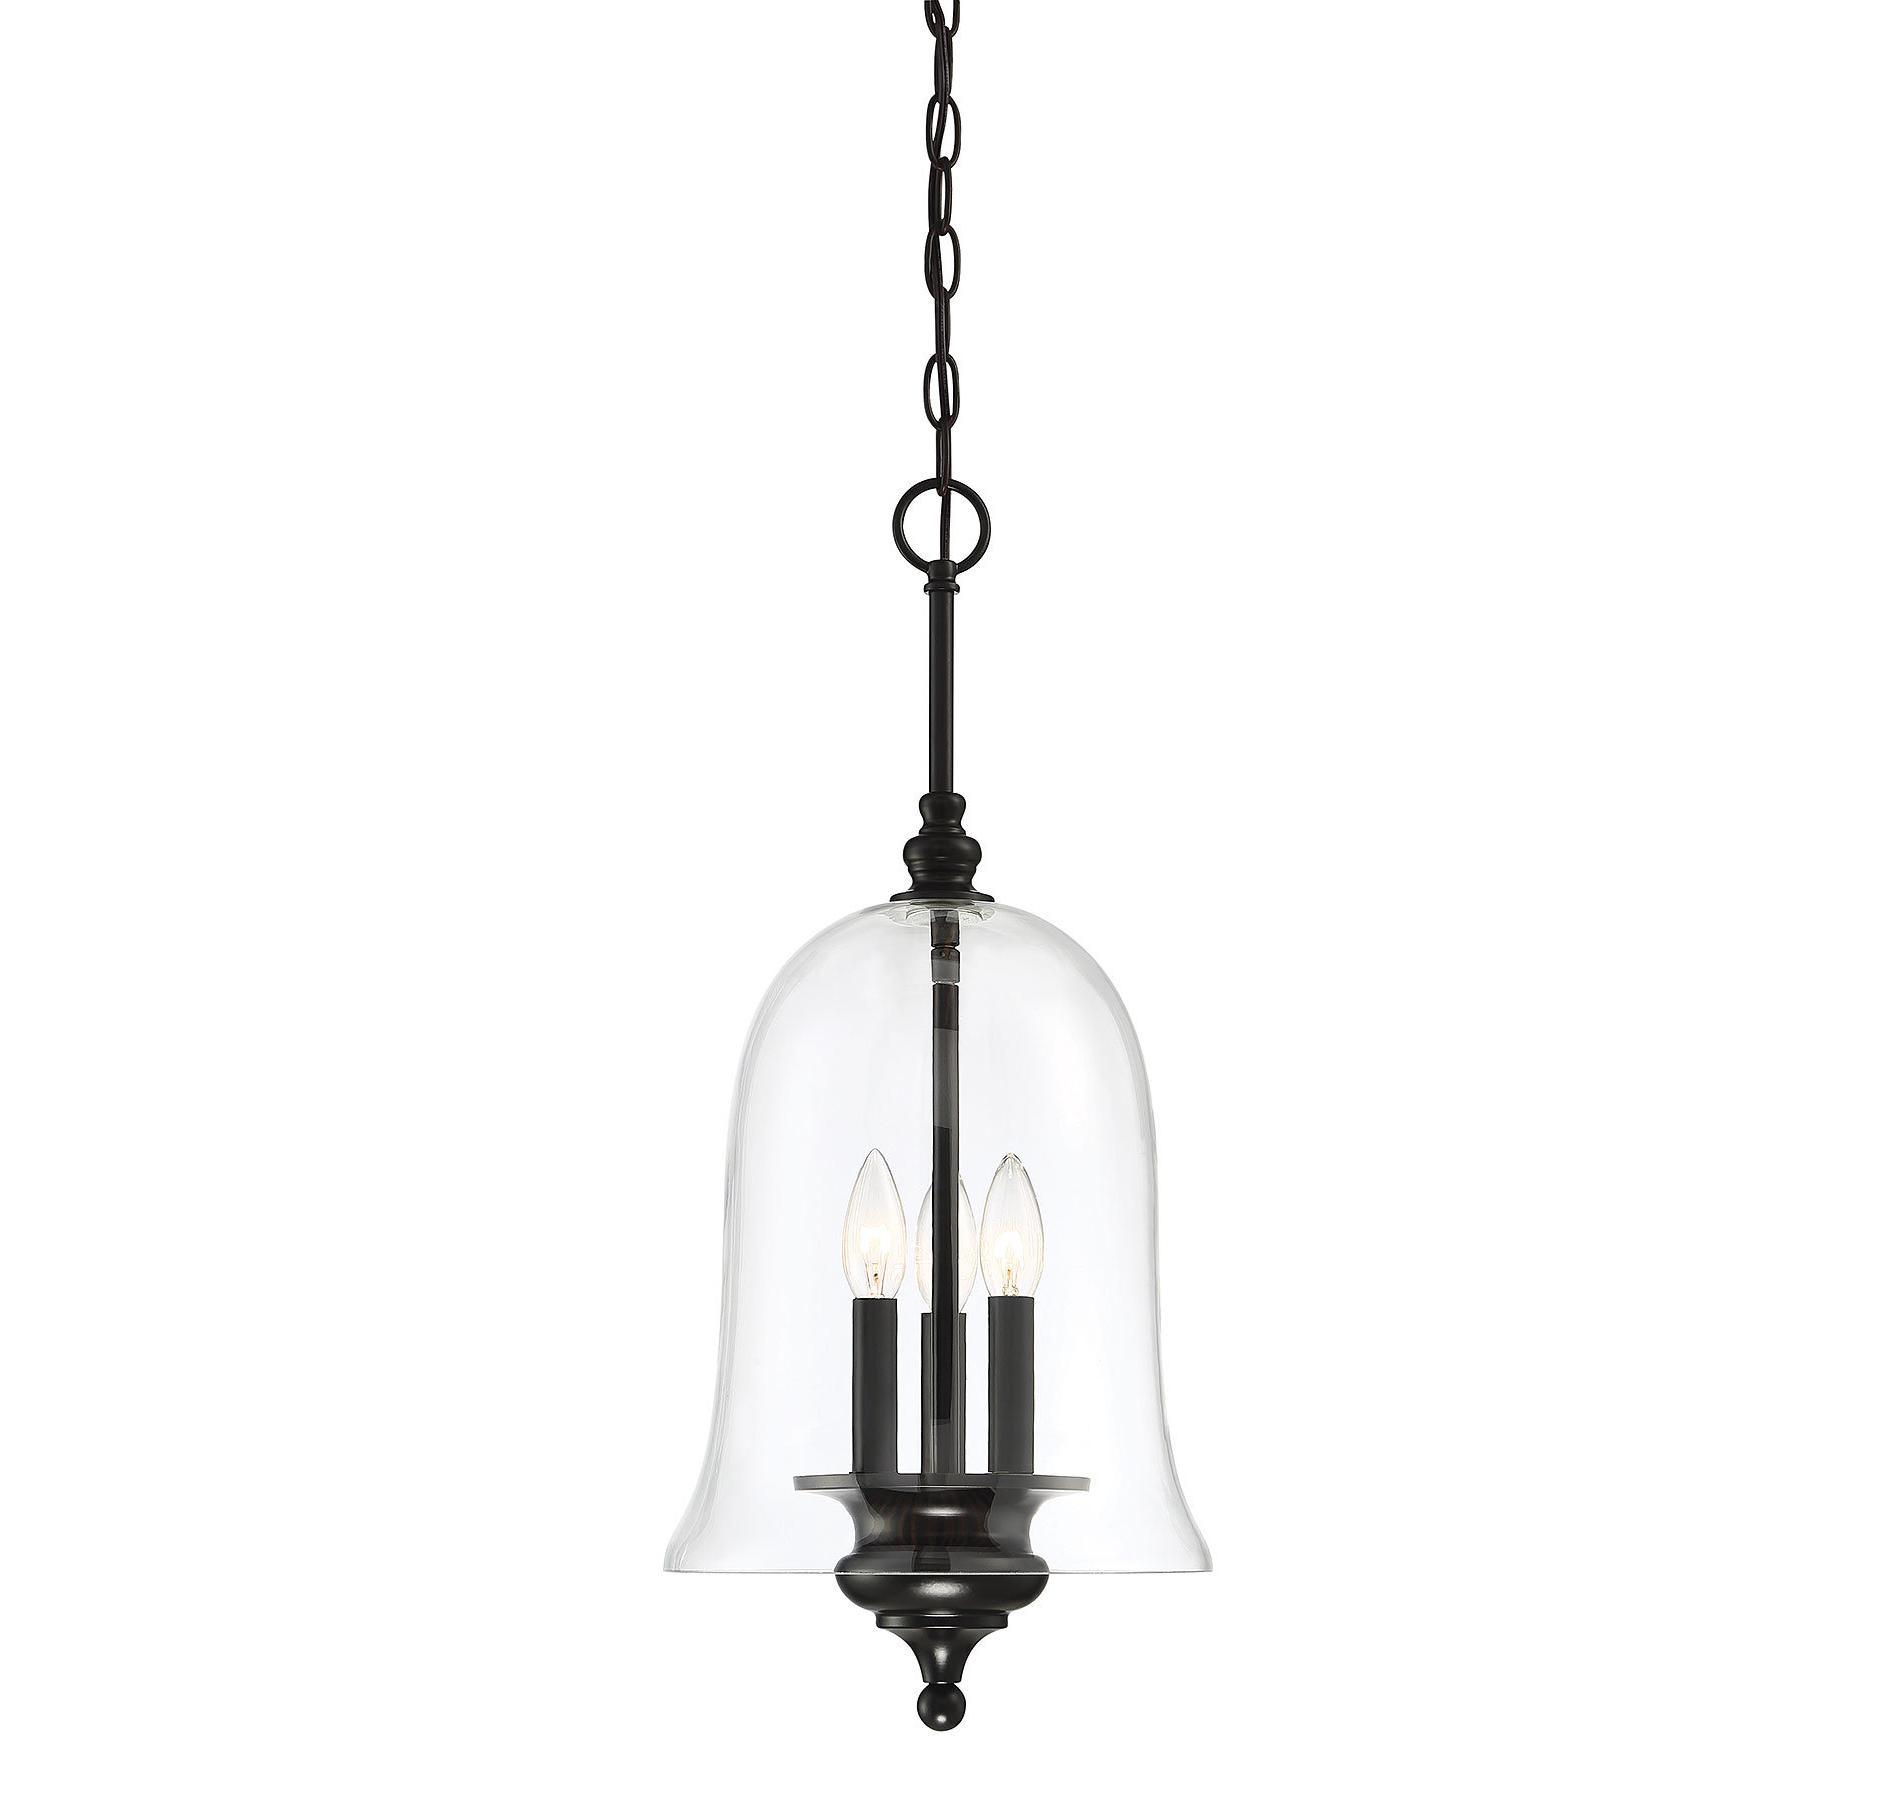 Yarger 1-Light Single Bell Pendants pertaining to Newest Youngberg 3-Light Single Bell Pendant